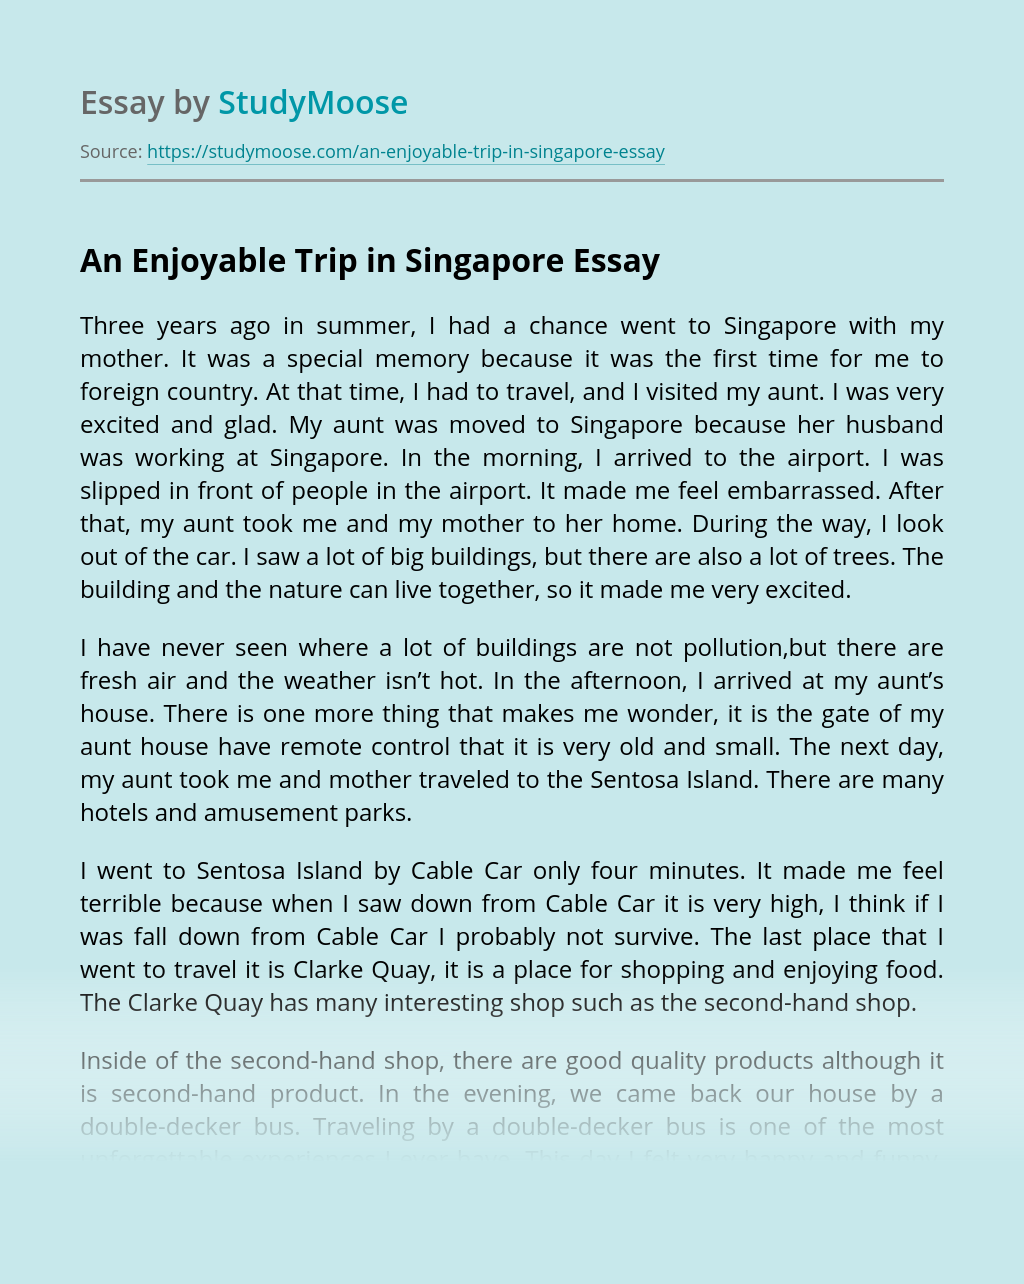 An Enjoyable Trip in Singapore